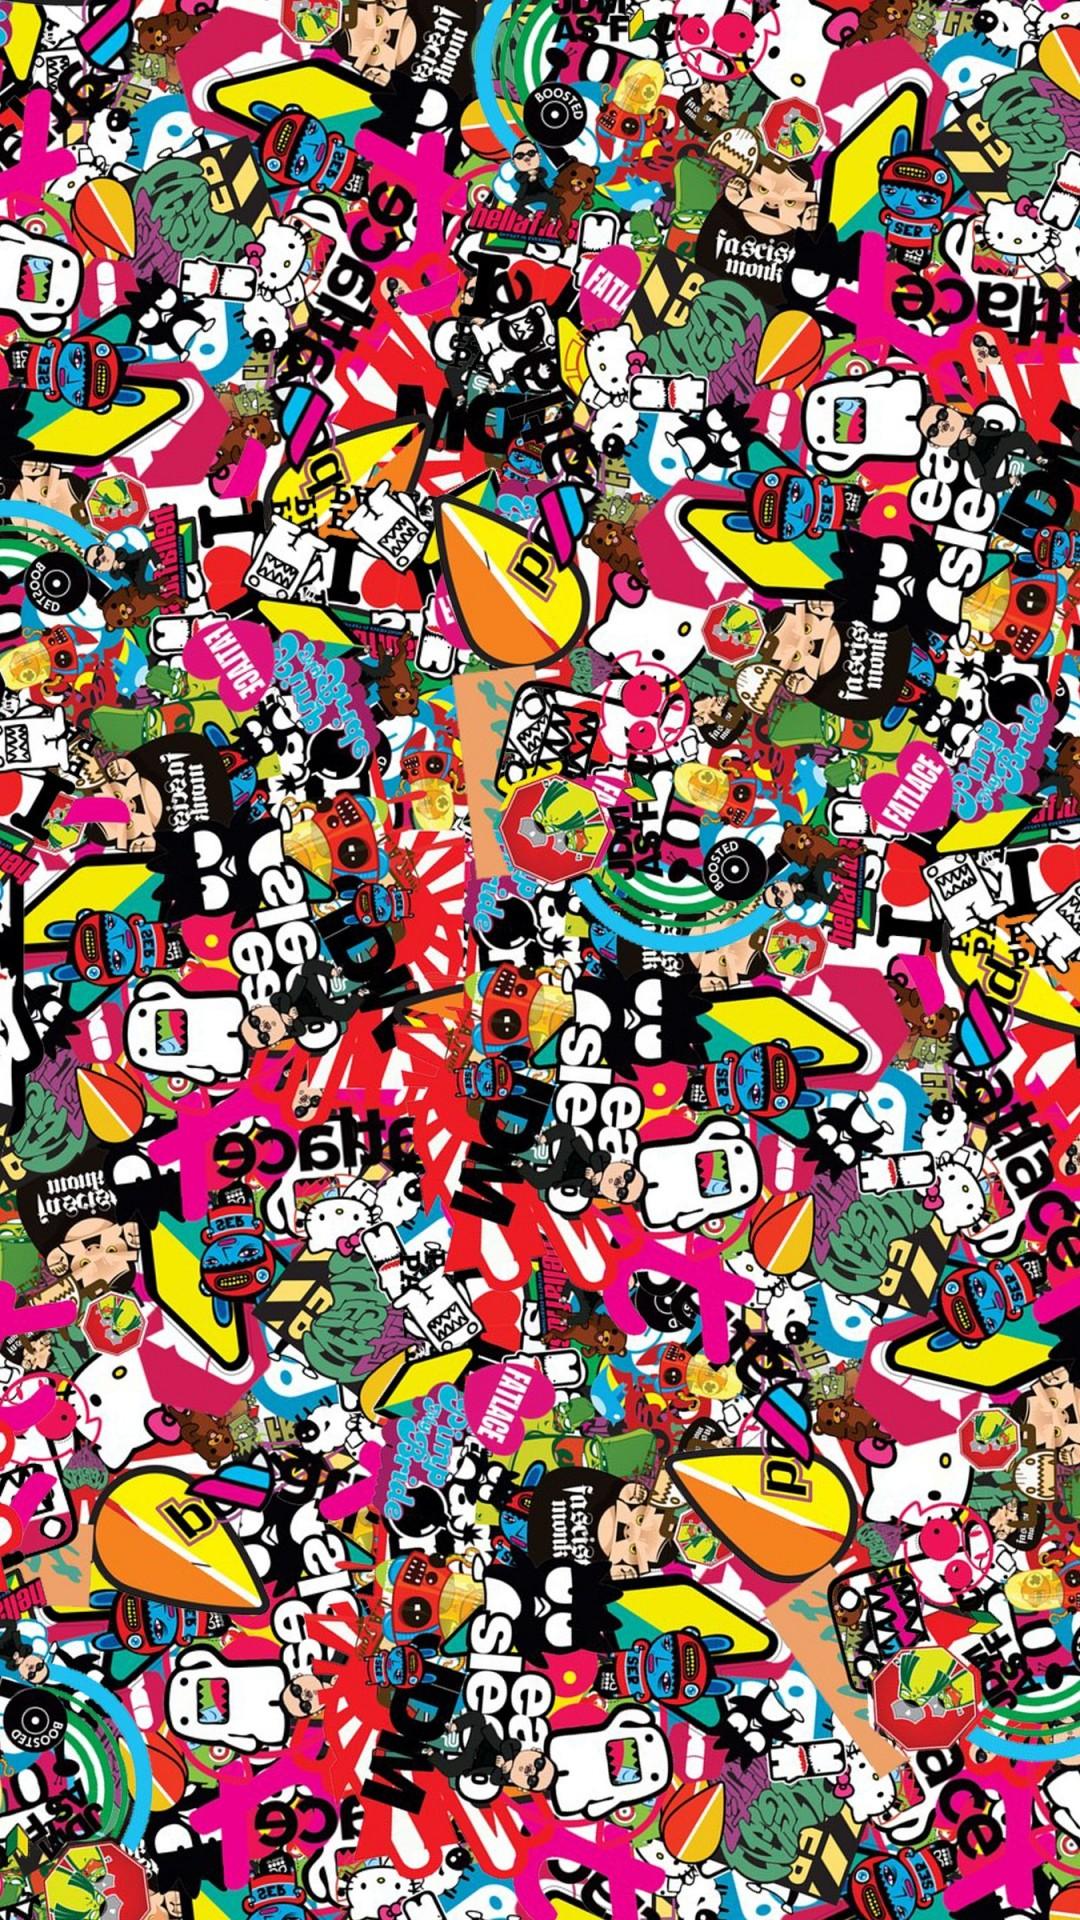 Jdm Background Style Sticker Texture Wallpaper – 1080×1920